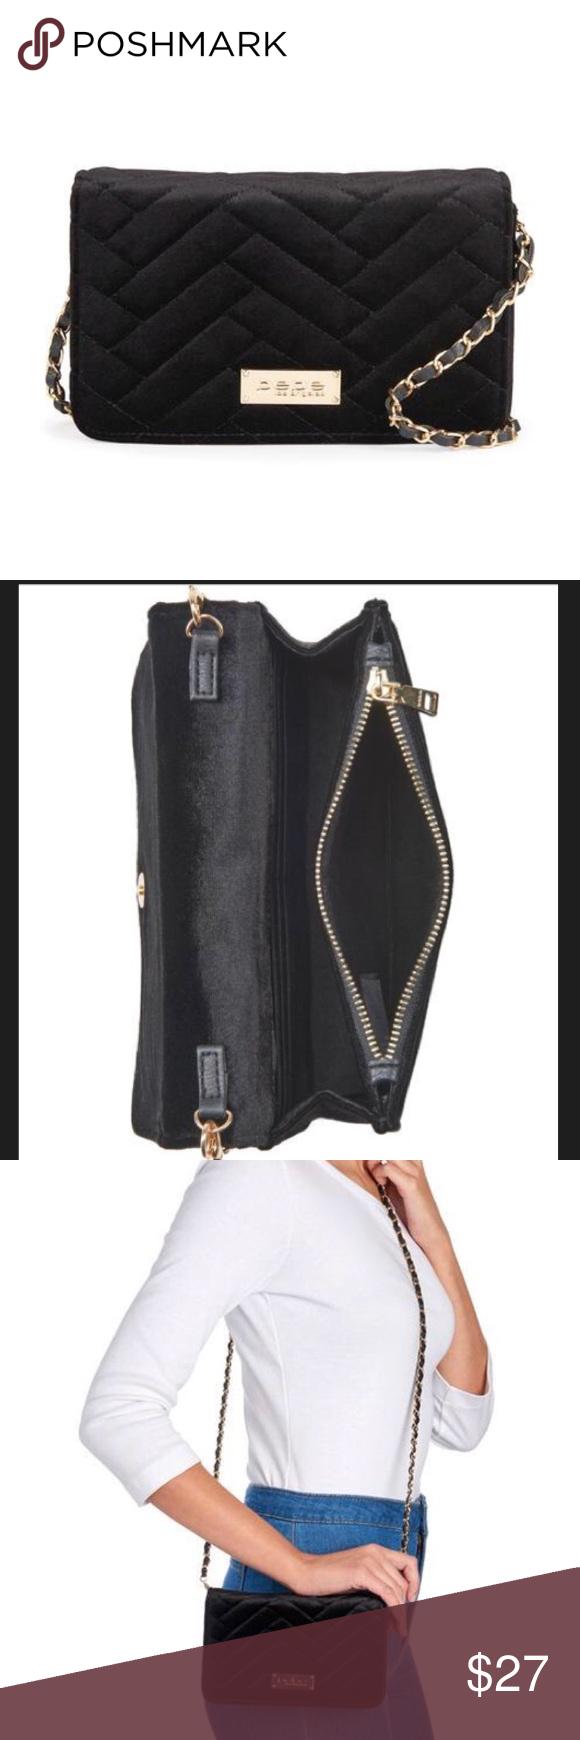 23b49a2d35 Brand New Black Bebe Crossbody Chain Purse Brand new black Bebe chain strap crossbody  purse. bebe Bags Crossbody Bags